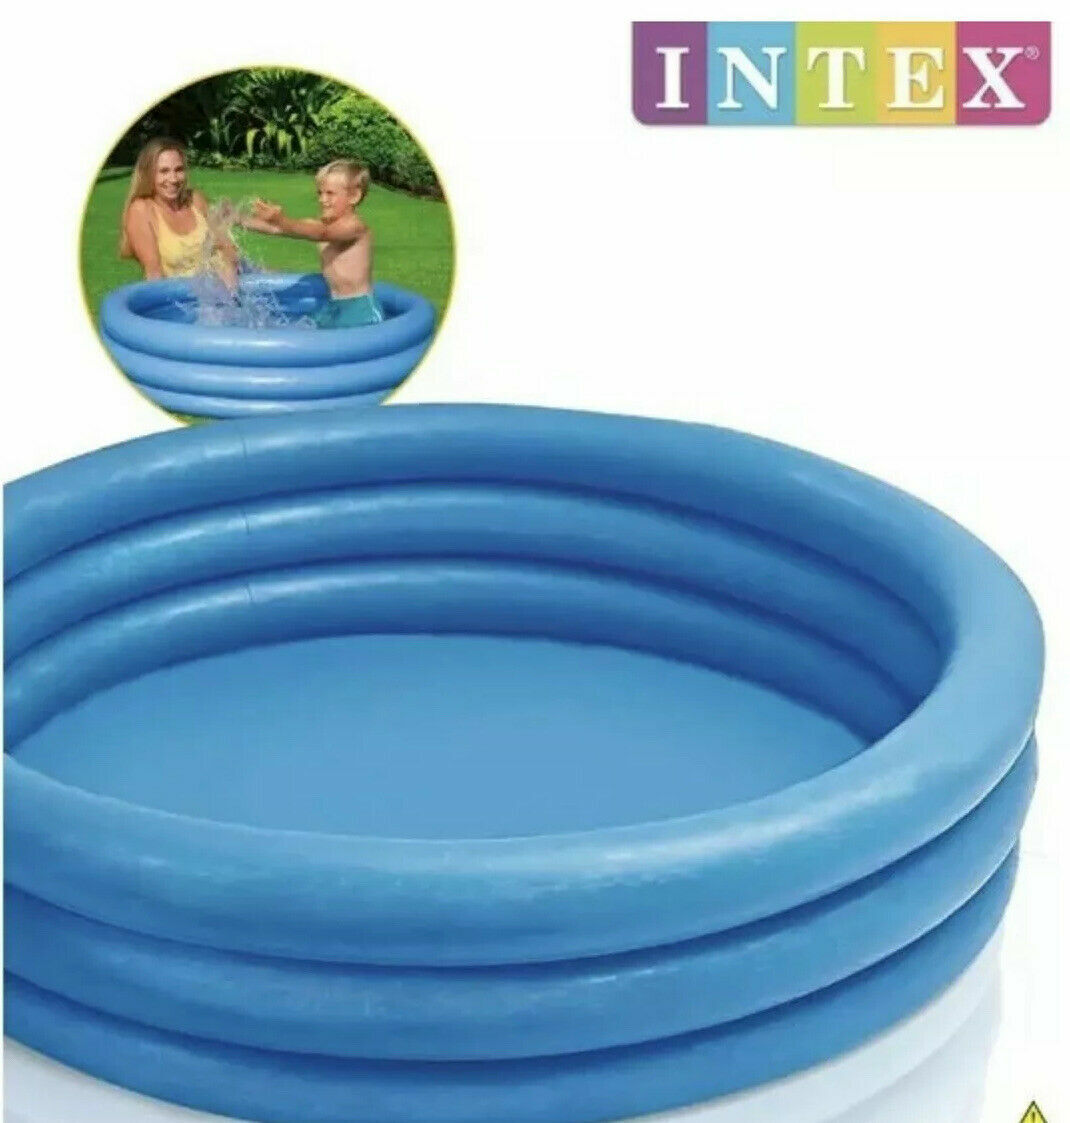 Intex Crystal Blue Paddling Pool Kids Summer Garden Outdoor Fun 3 Ring Pool 66